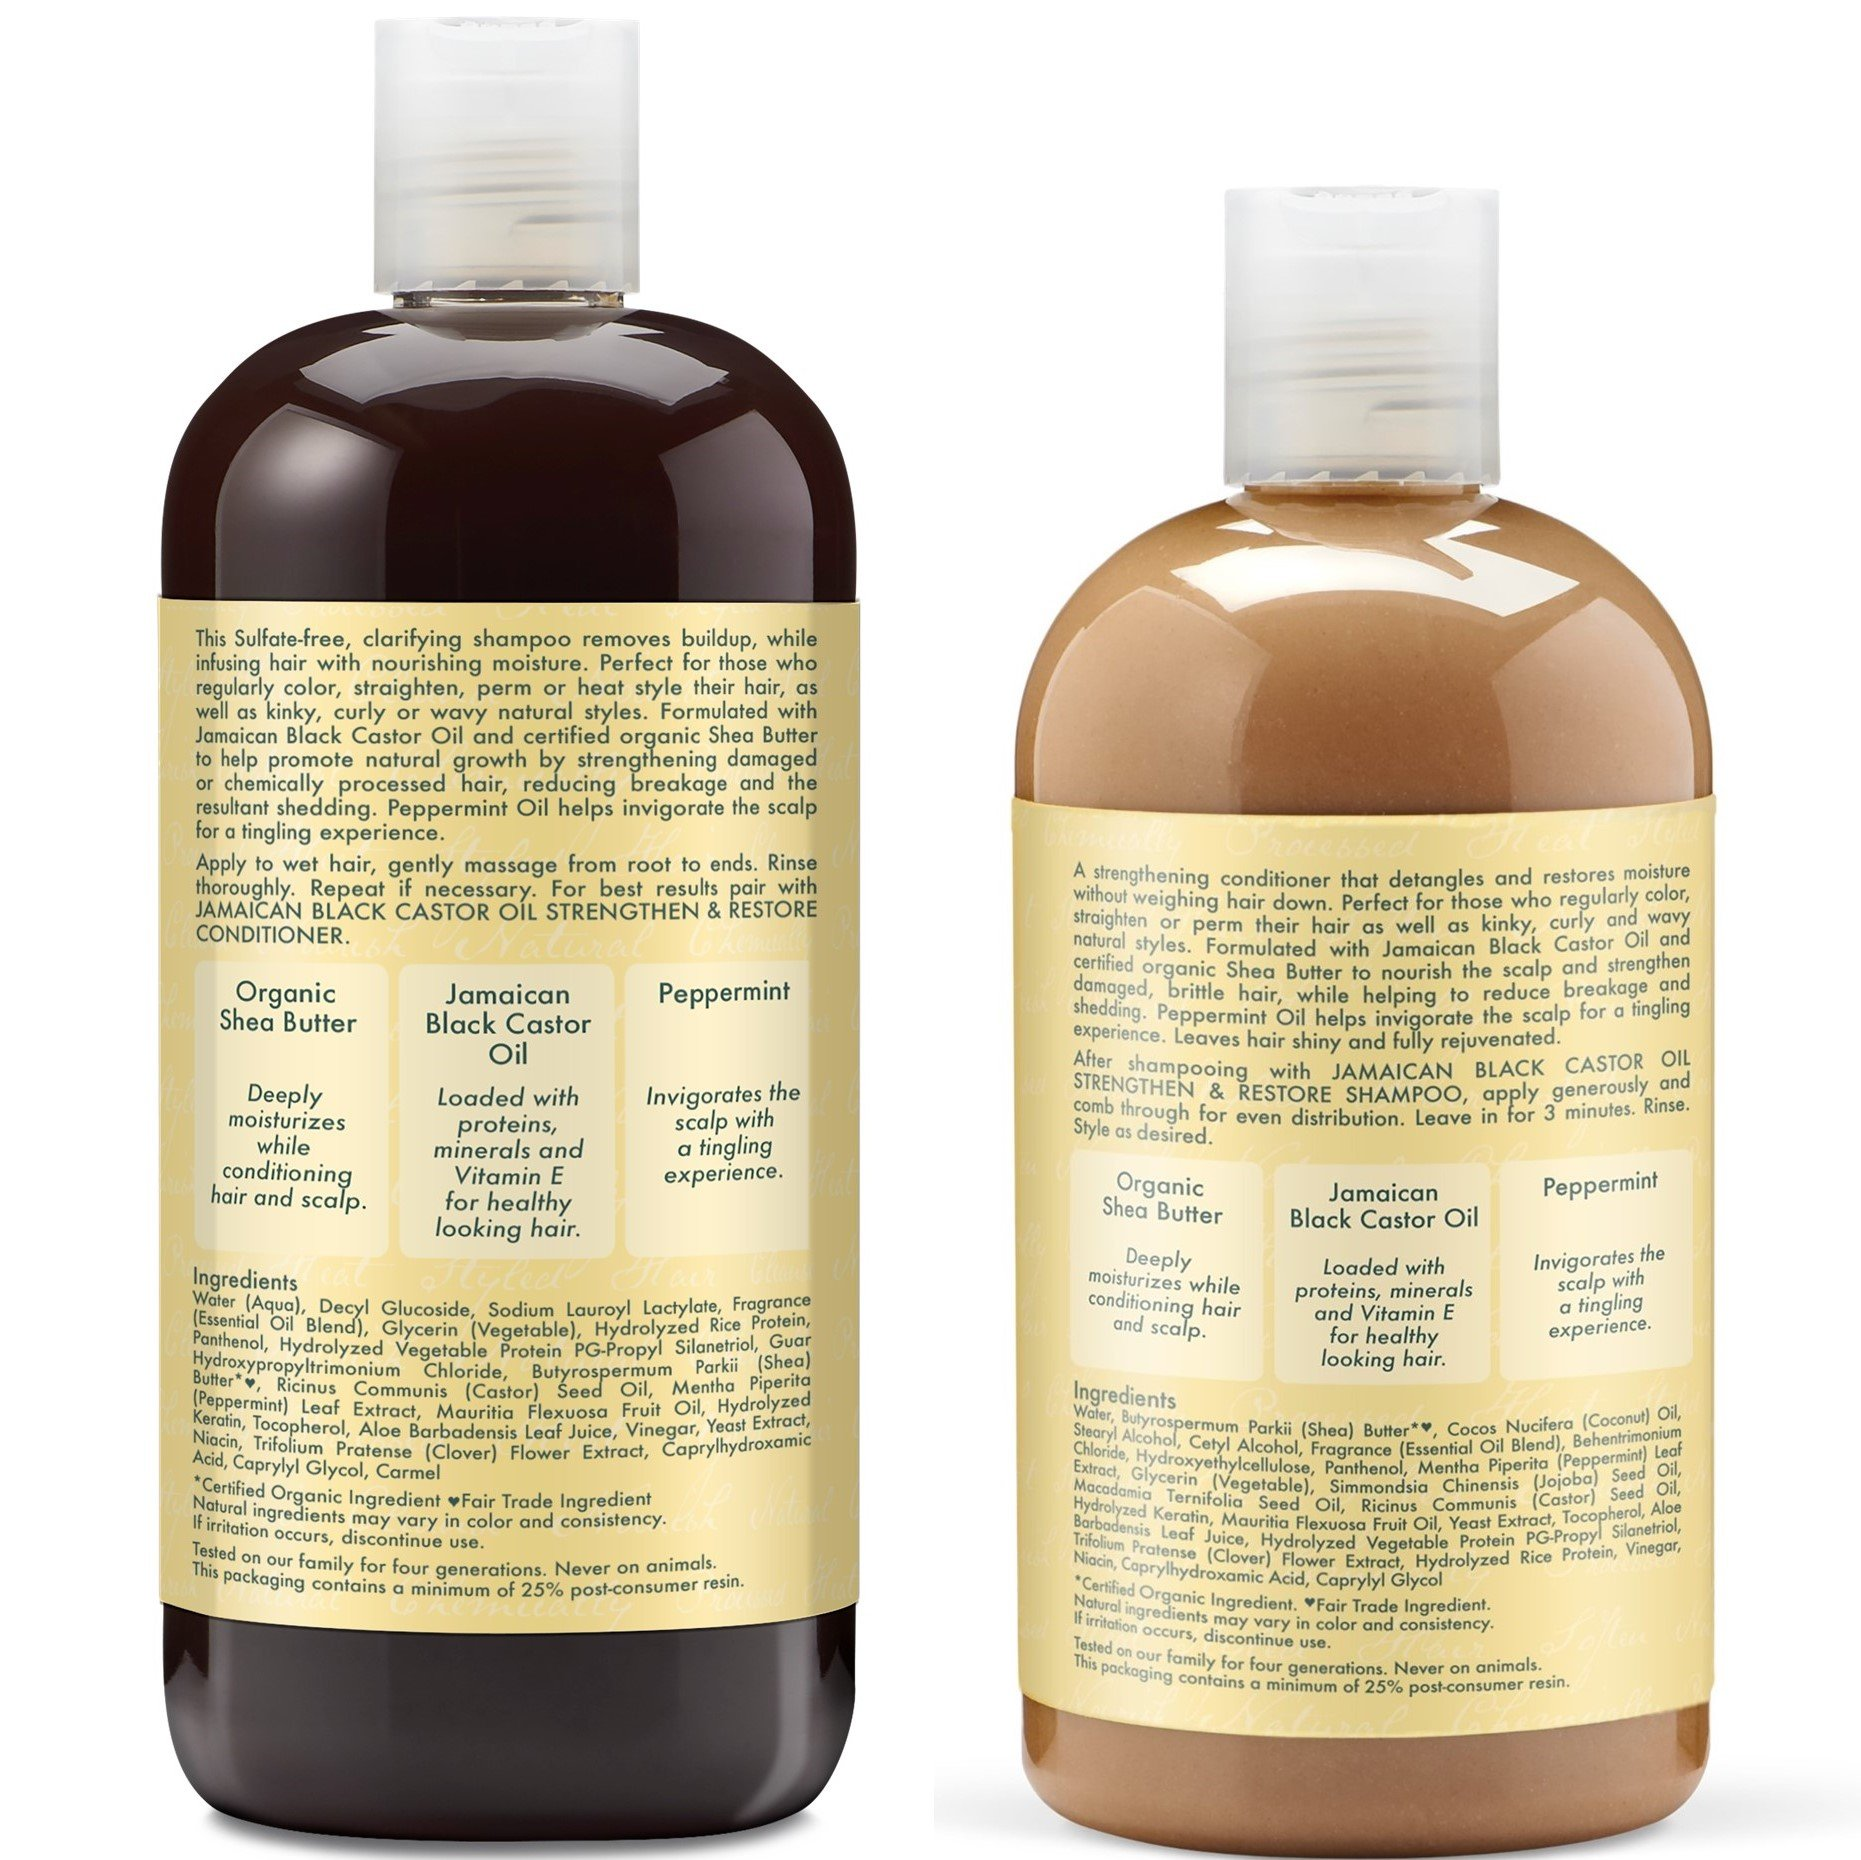 Shea Moisture  Strengthen, Grow & Restore Shampoo and Conditioner Set, Jamaican Black Castor Oil Combination Pack, 16.3 oz Shampoo & 13 oz. Conditioner by Shea Moisture (Image #4)